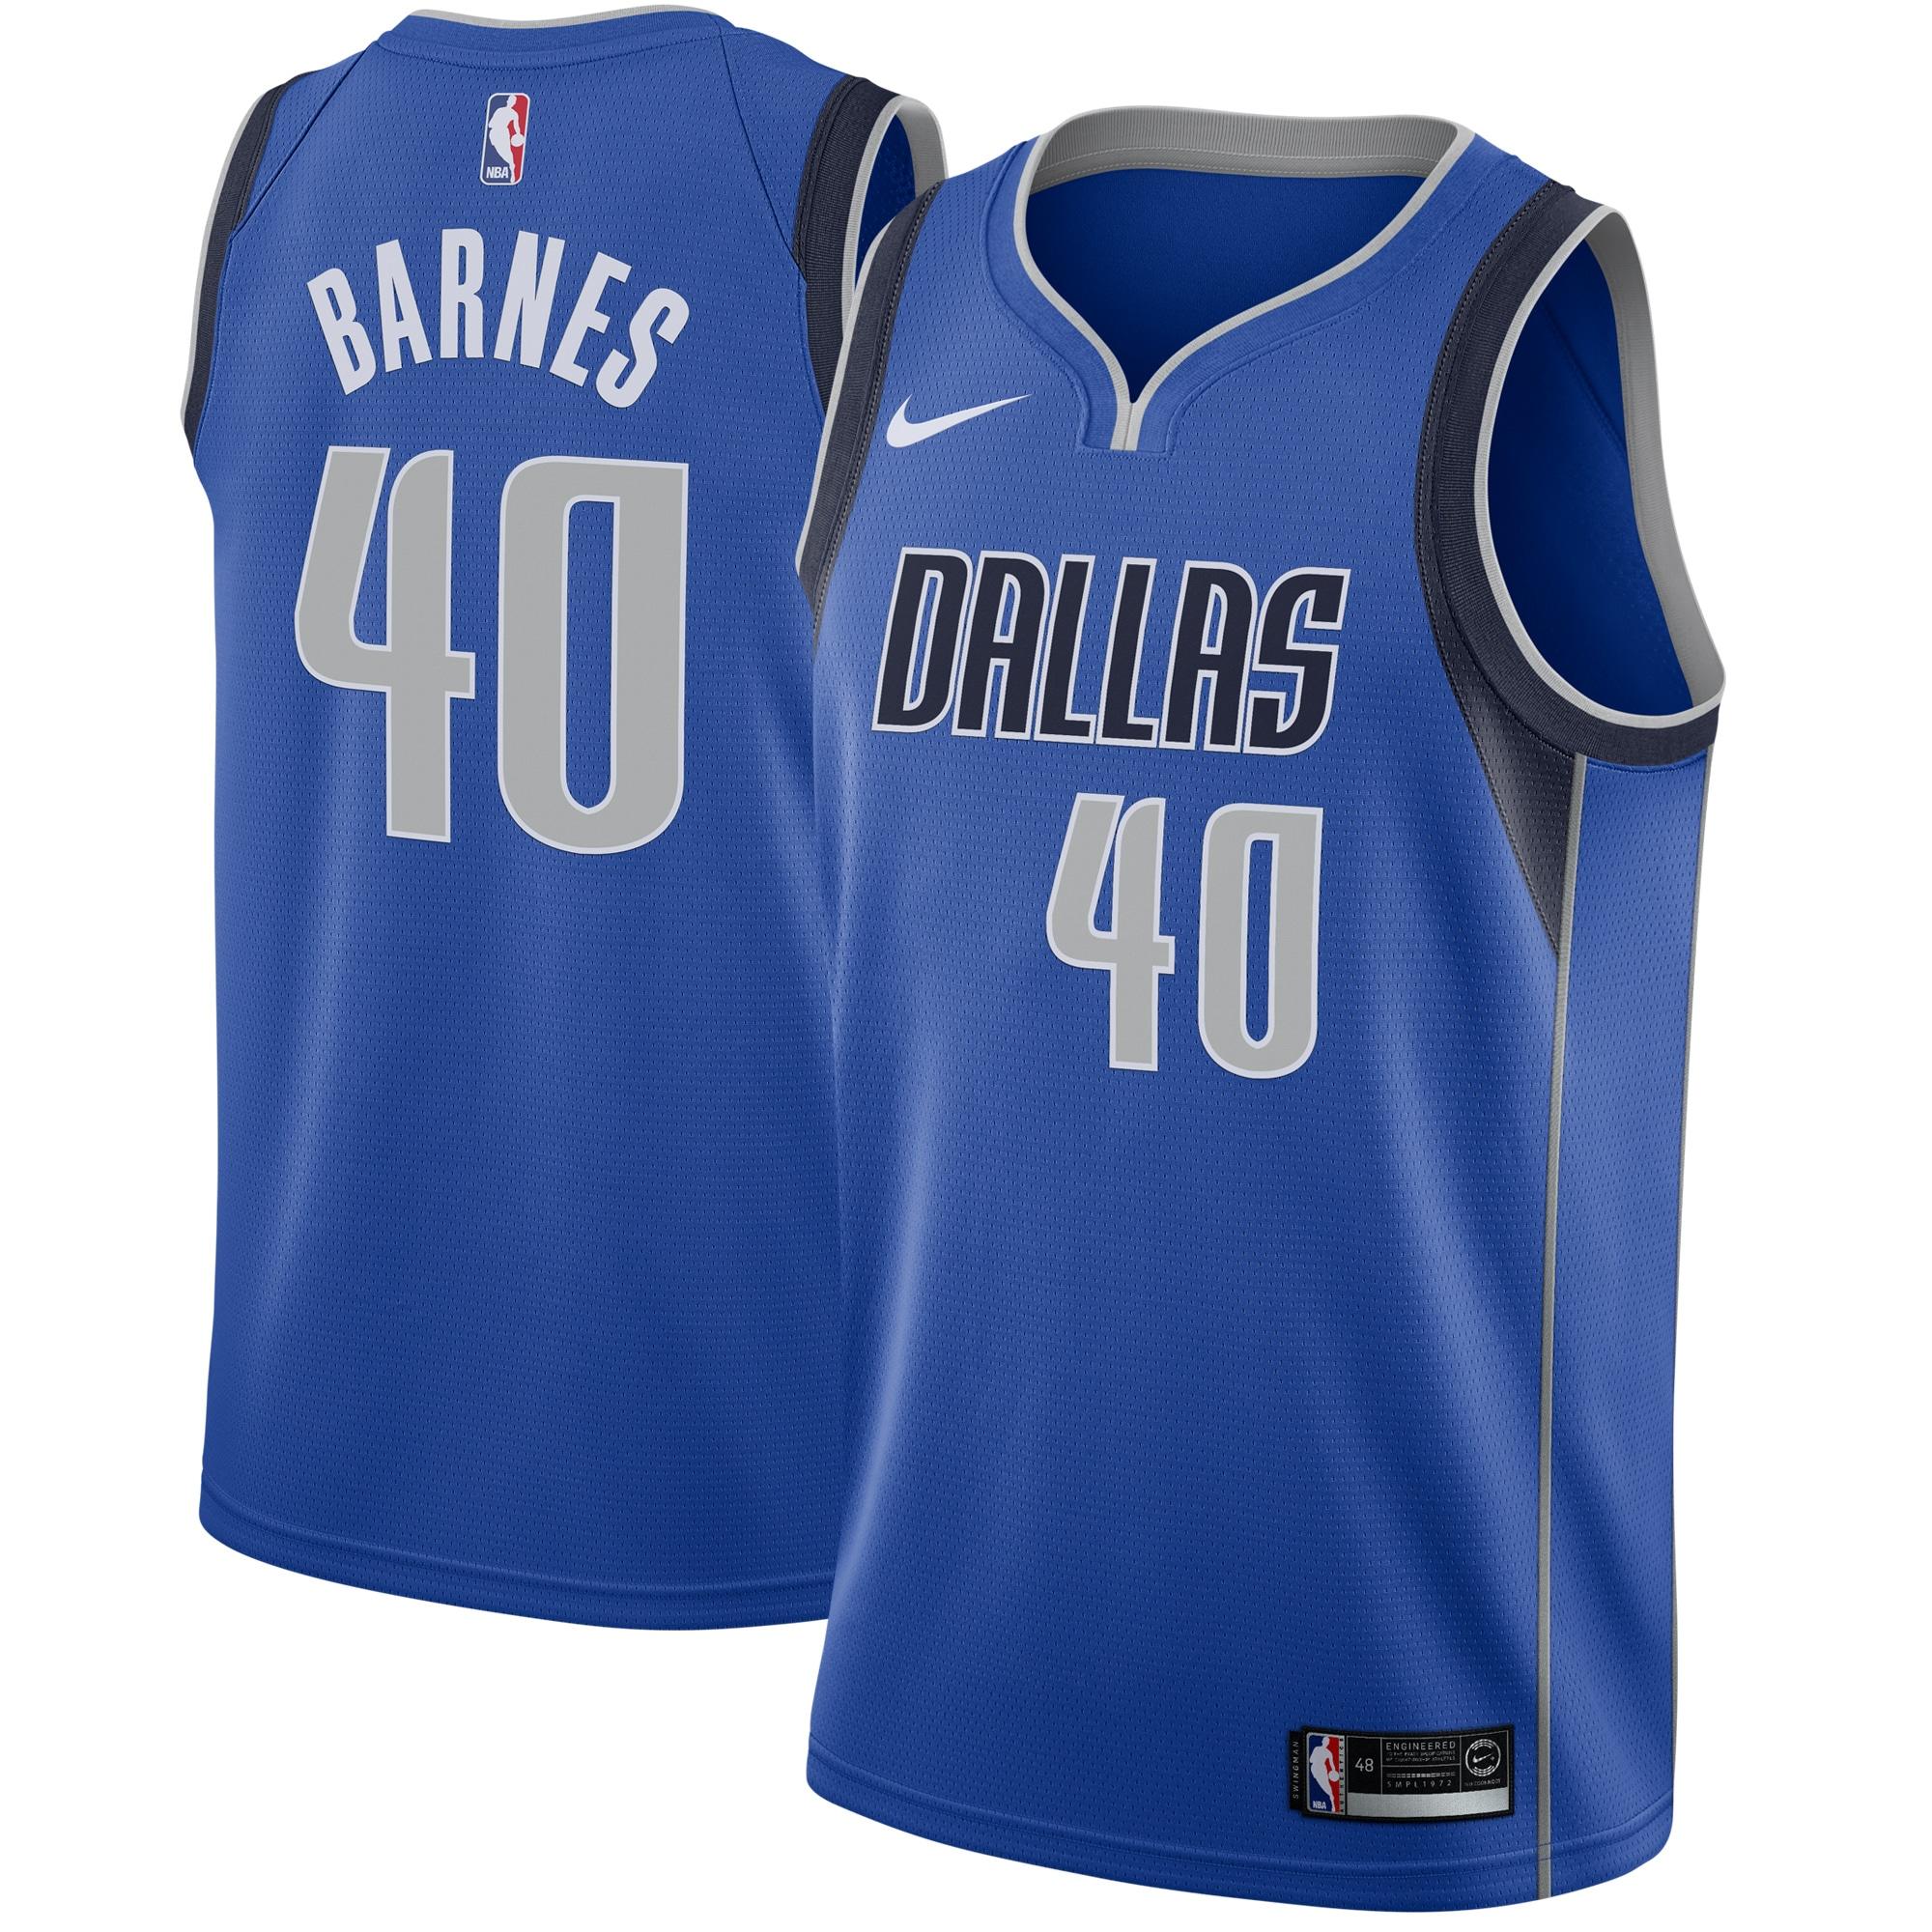 Harrison Barnes Dallas Mavericks Nike Swingman Jersey Royal - Icon Edition